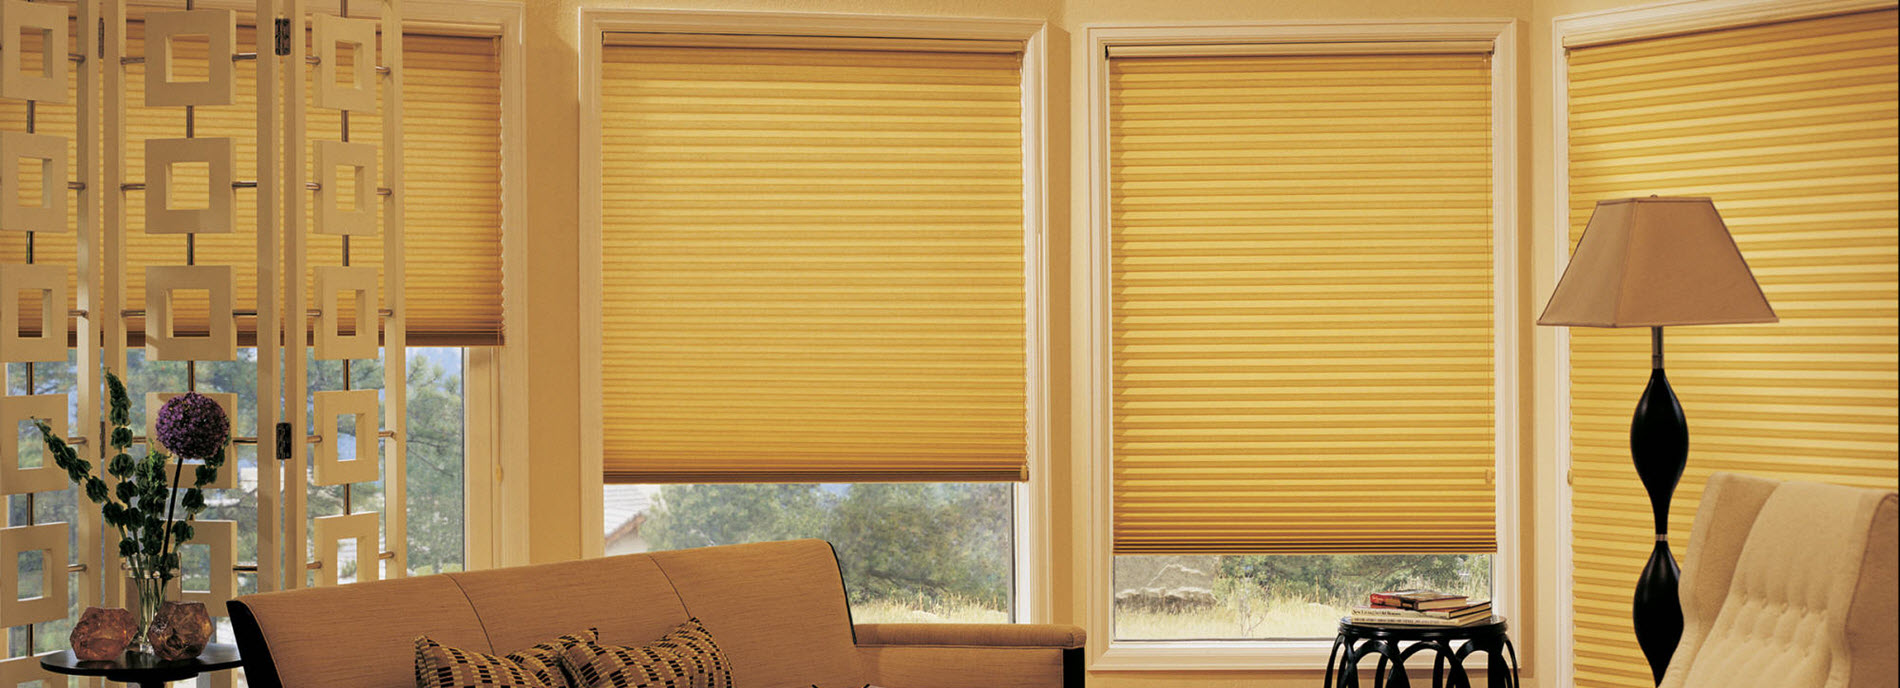 Upvc Windows Aluminium Windows Blinds And Curtains